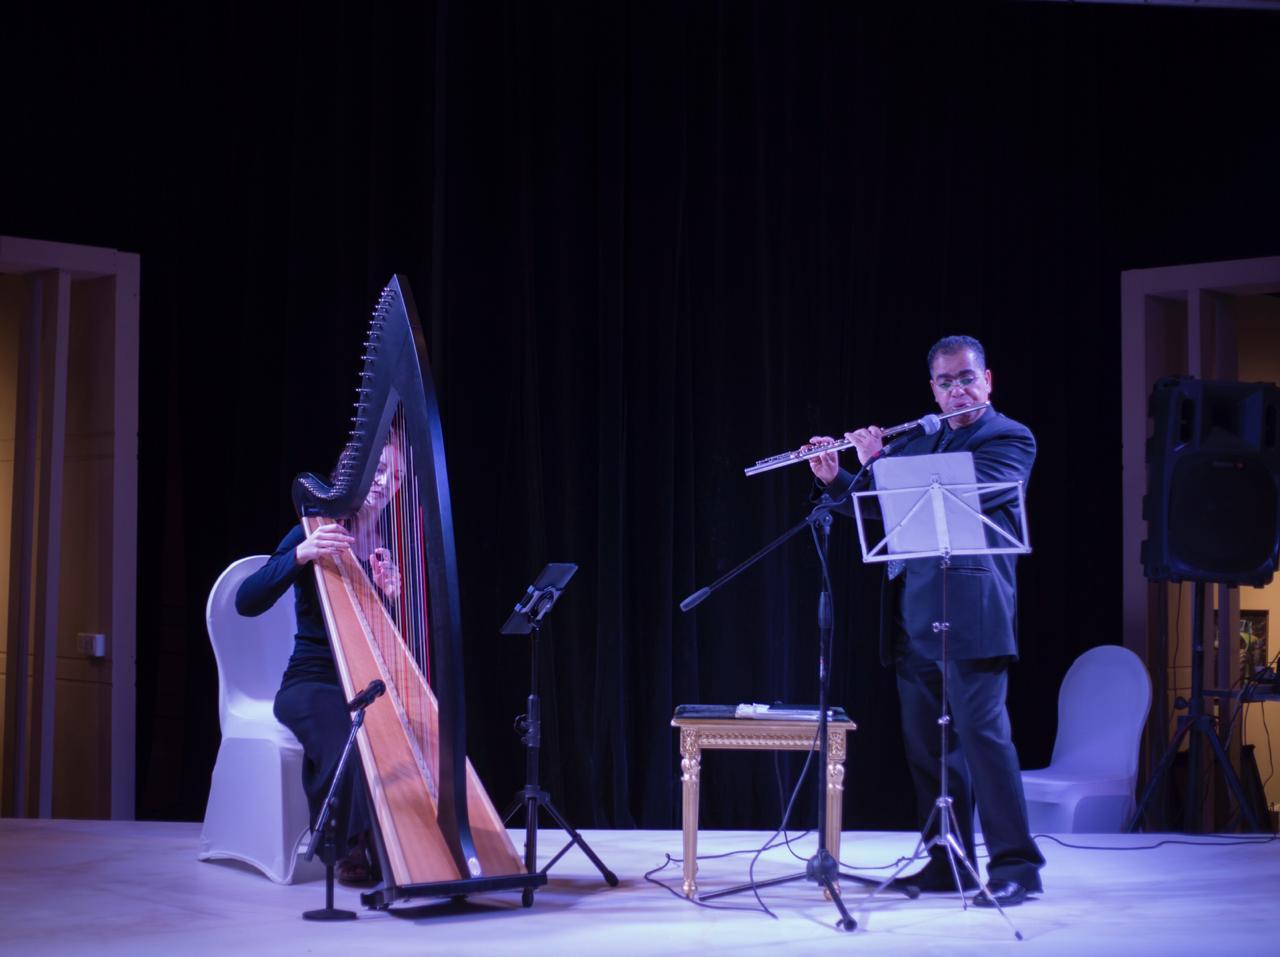 Harp and Flute Duet Saudi Arabia